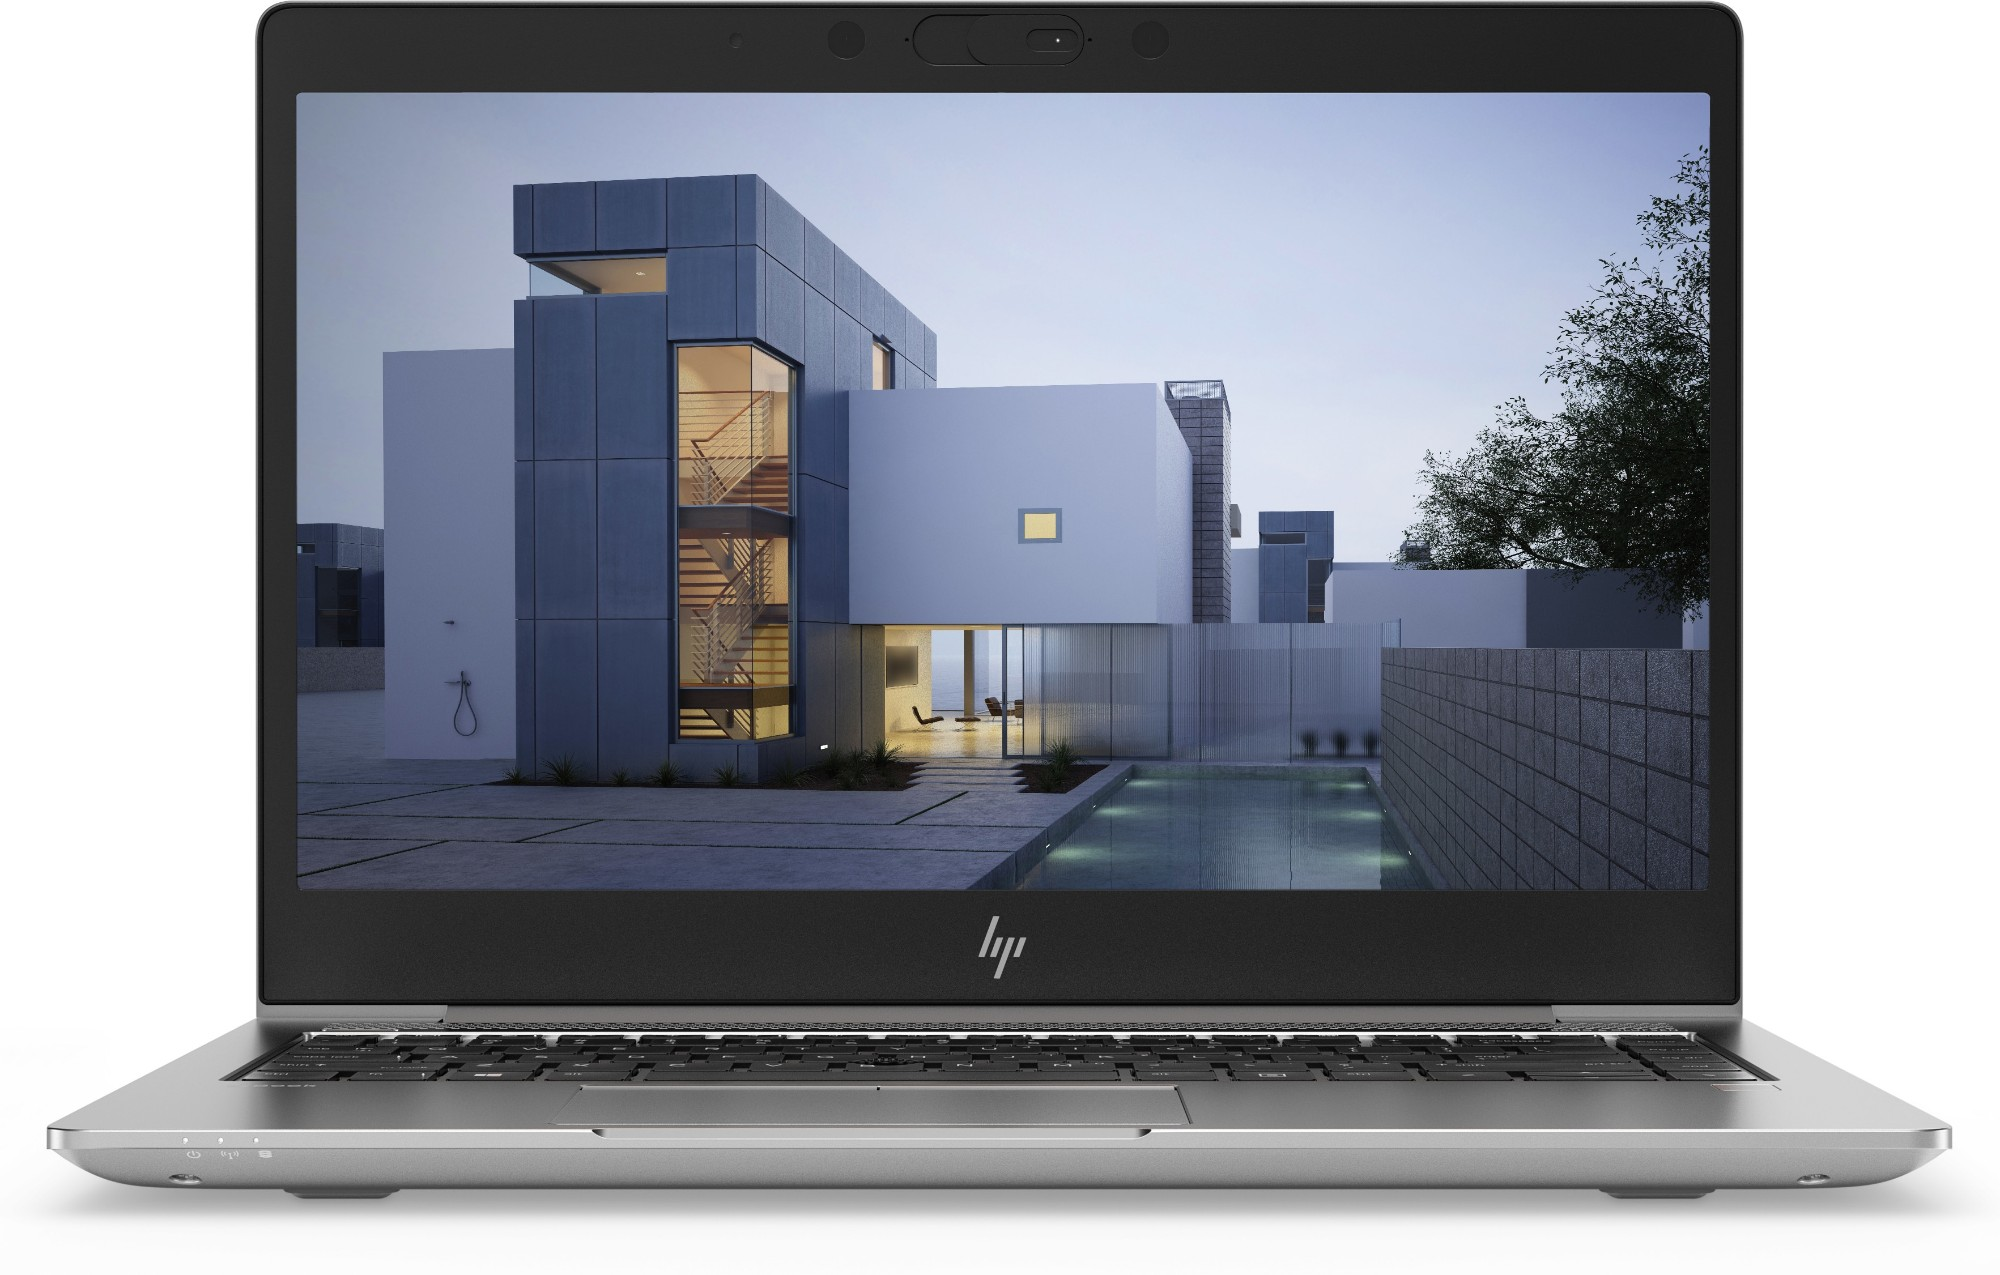 Hp webcam 3100 windows 10